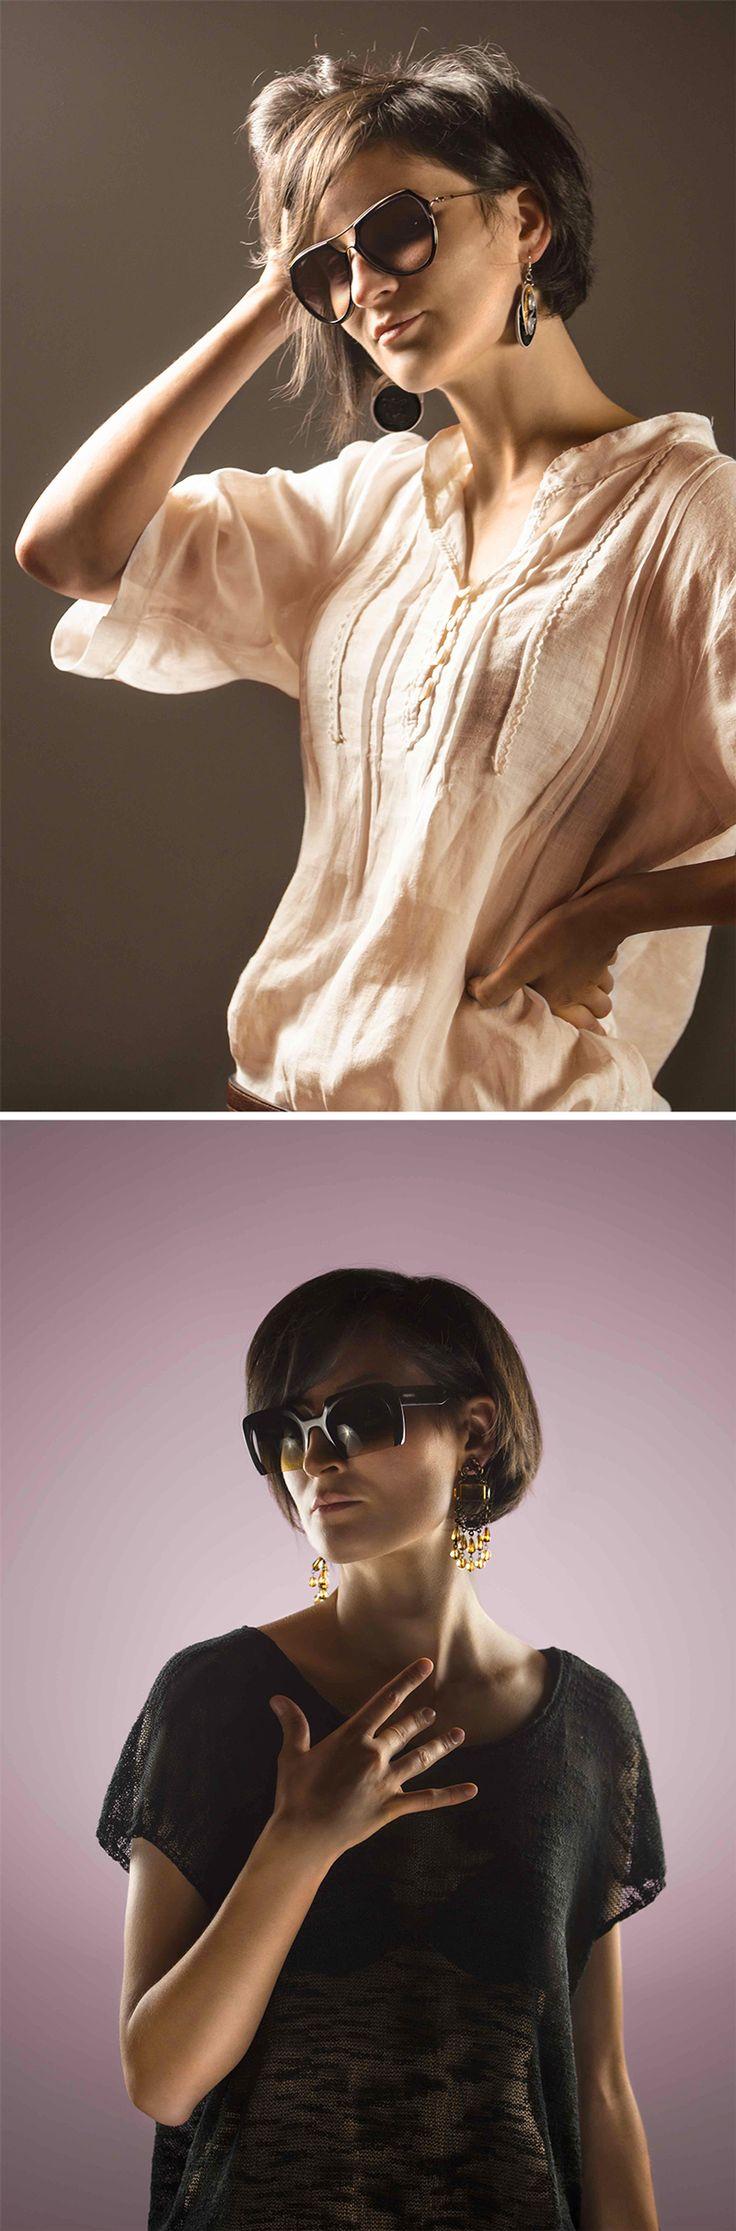 Shooting Ottici De Vidal | www.ofmagnet.com #photo #shooting #glasses #sunglasses #people #lookbook #fashion #girl #branding